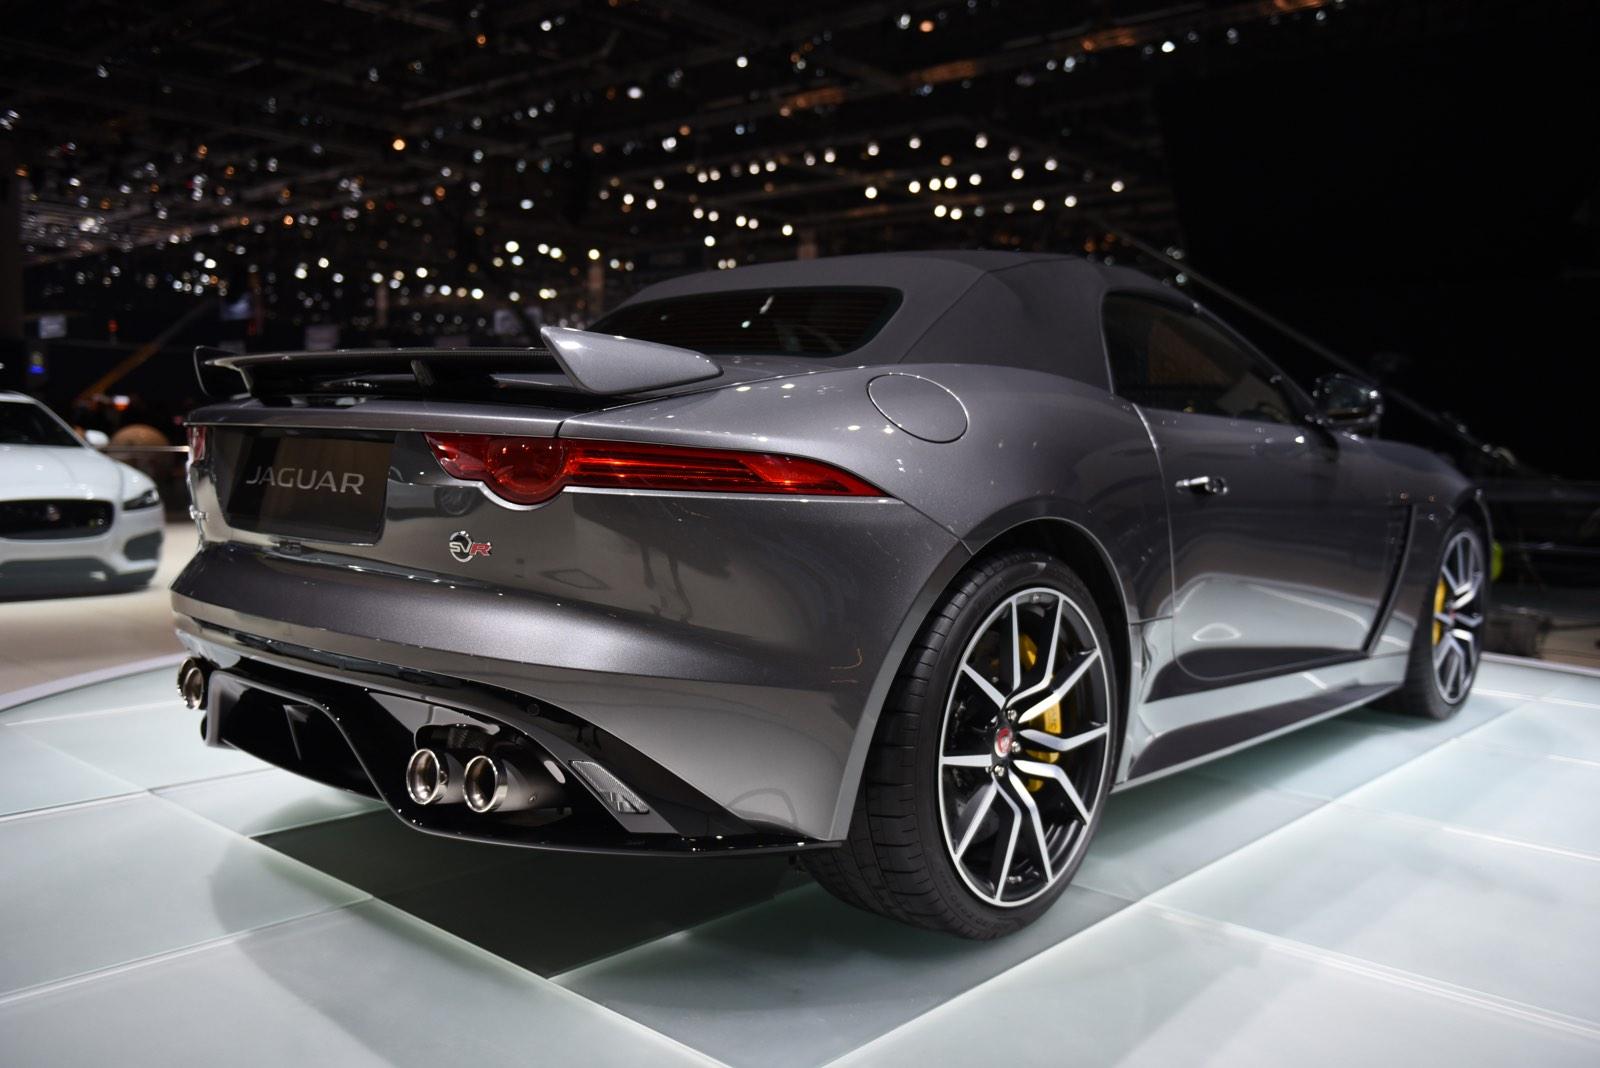 Geneva 2016: Jaguar F-Type SVR - GTspirit